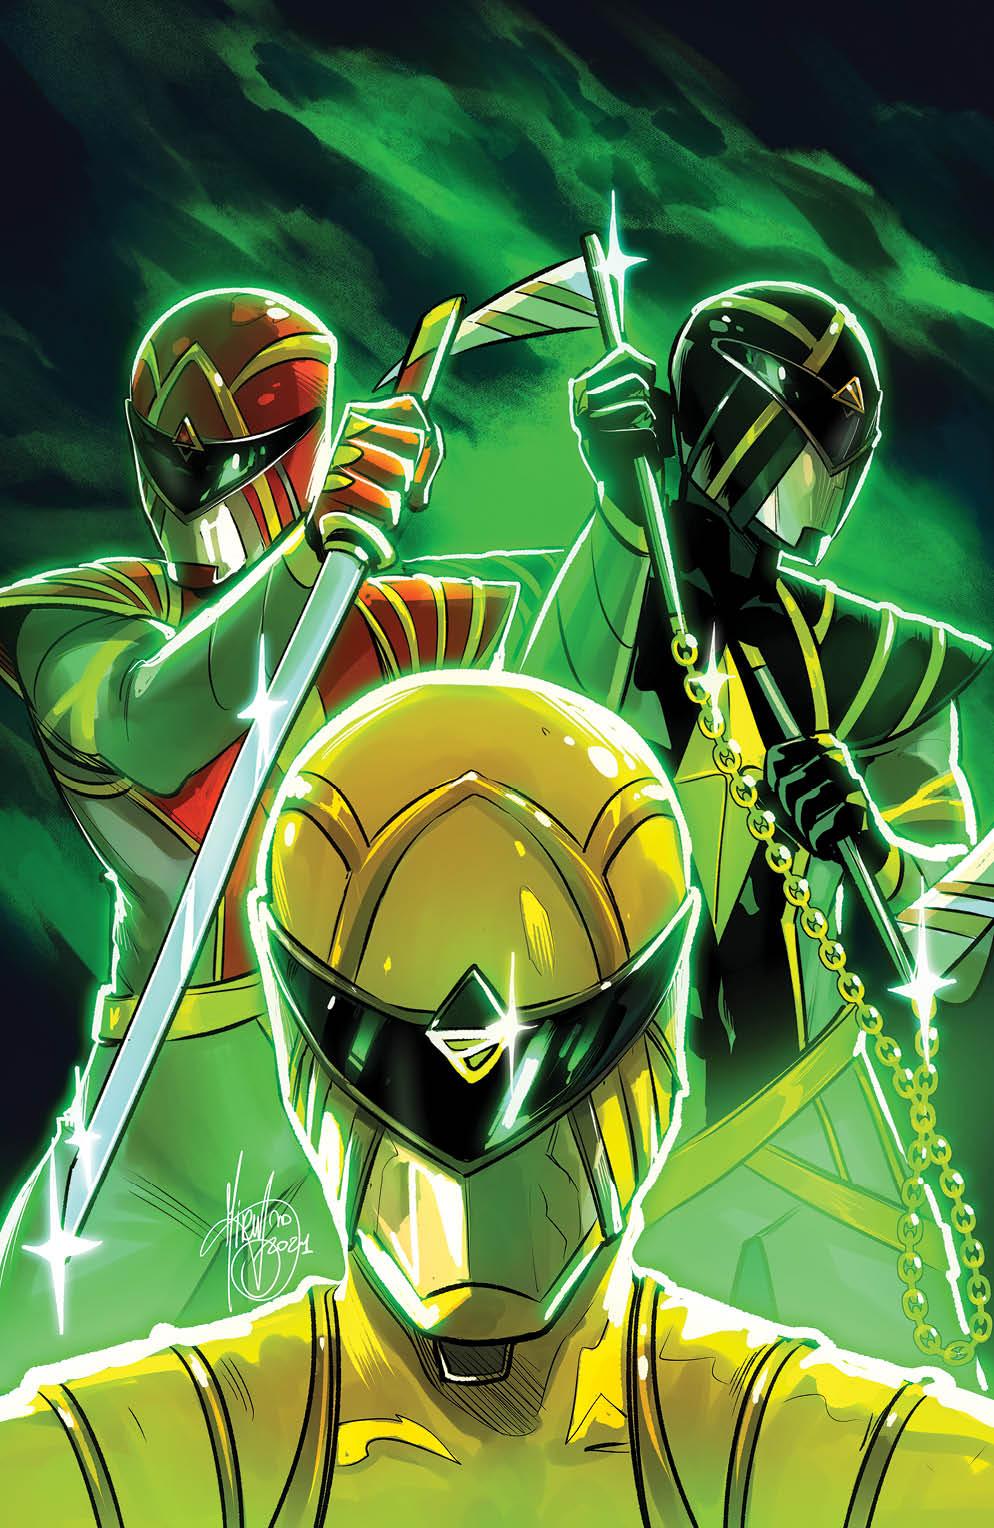 STL201252_1 ComicList: BOOM! Studios New Releases for 07/21/2021